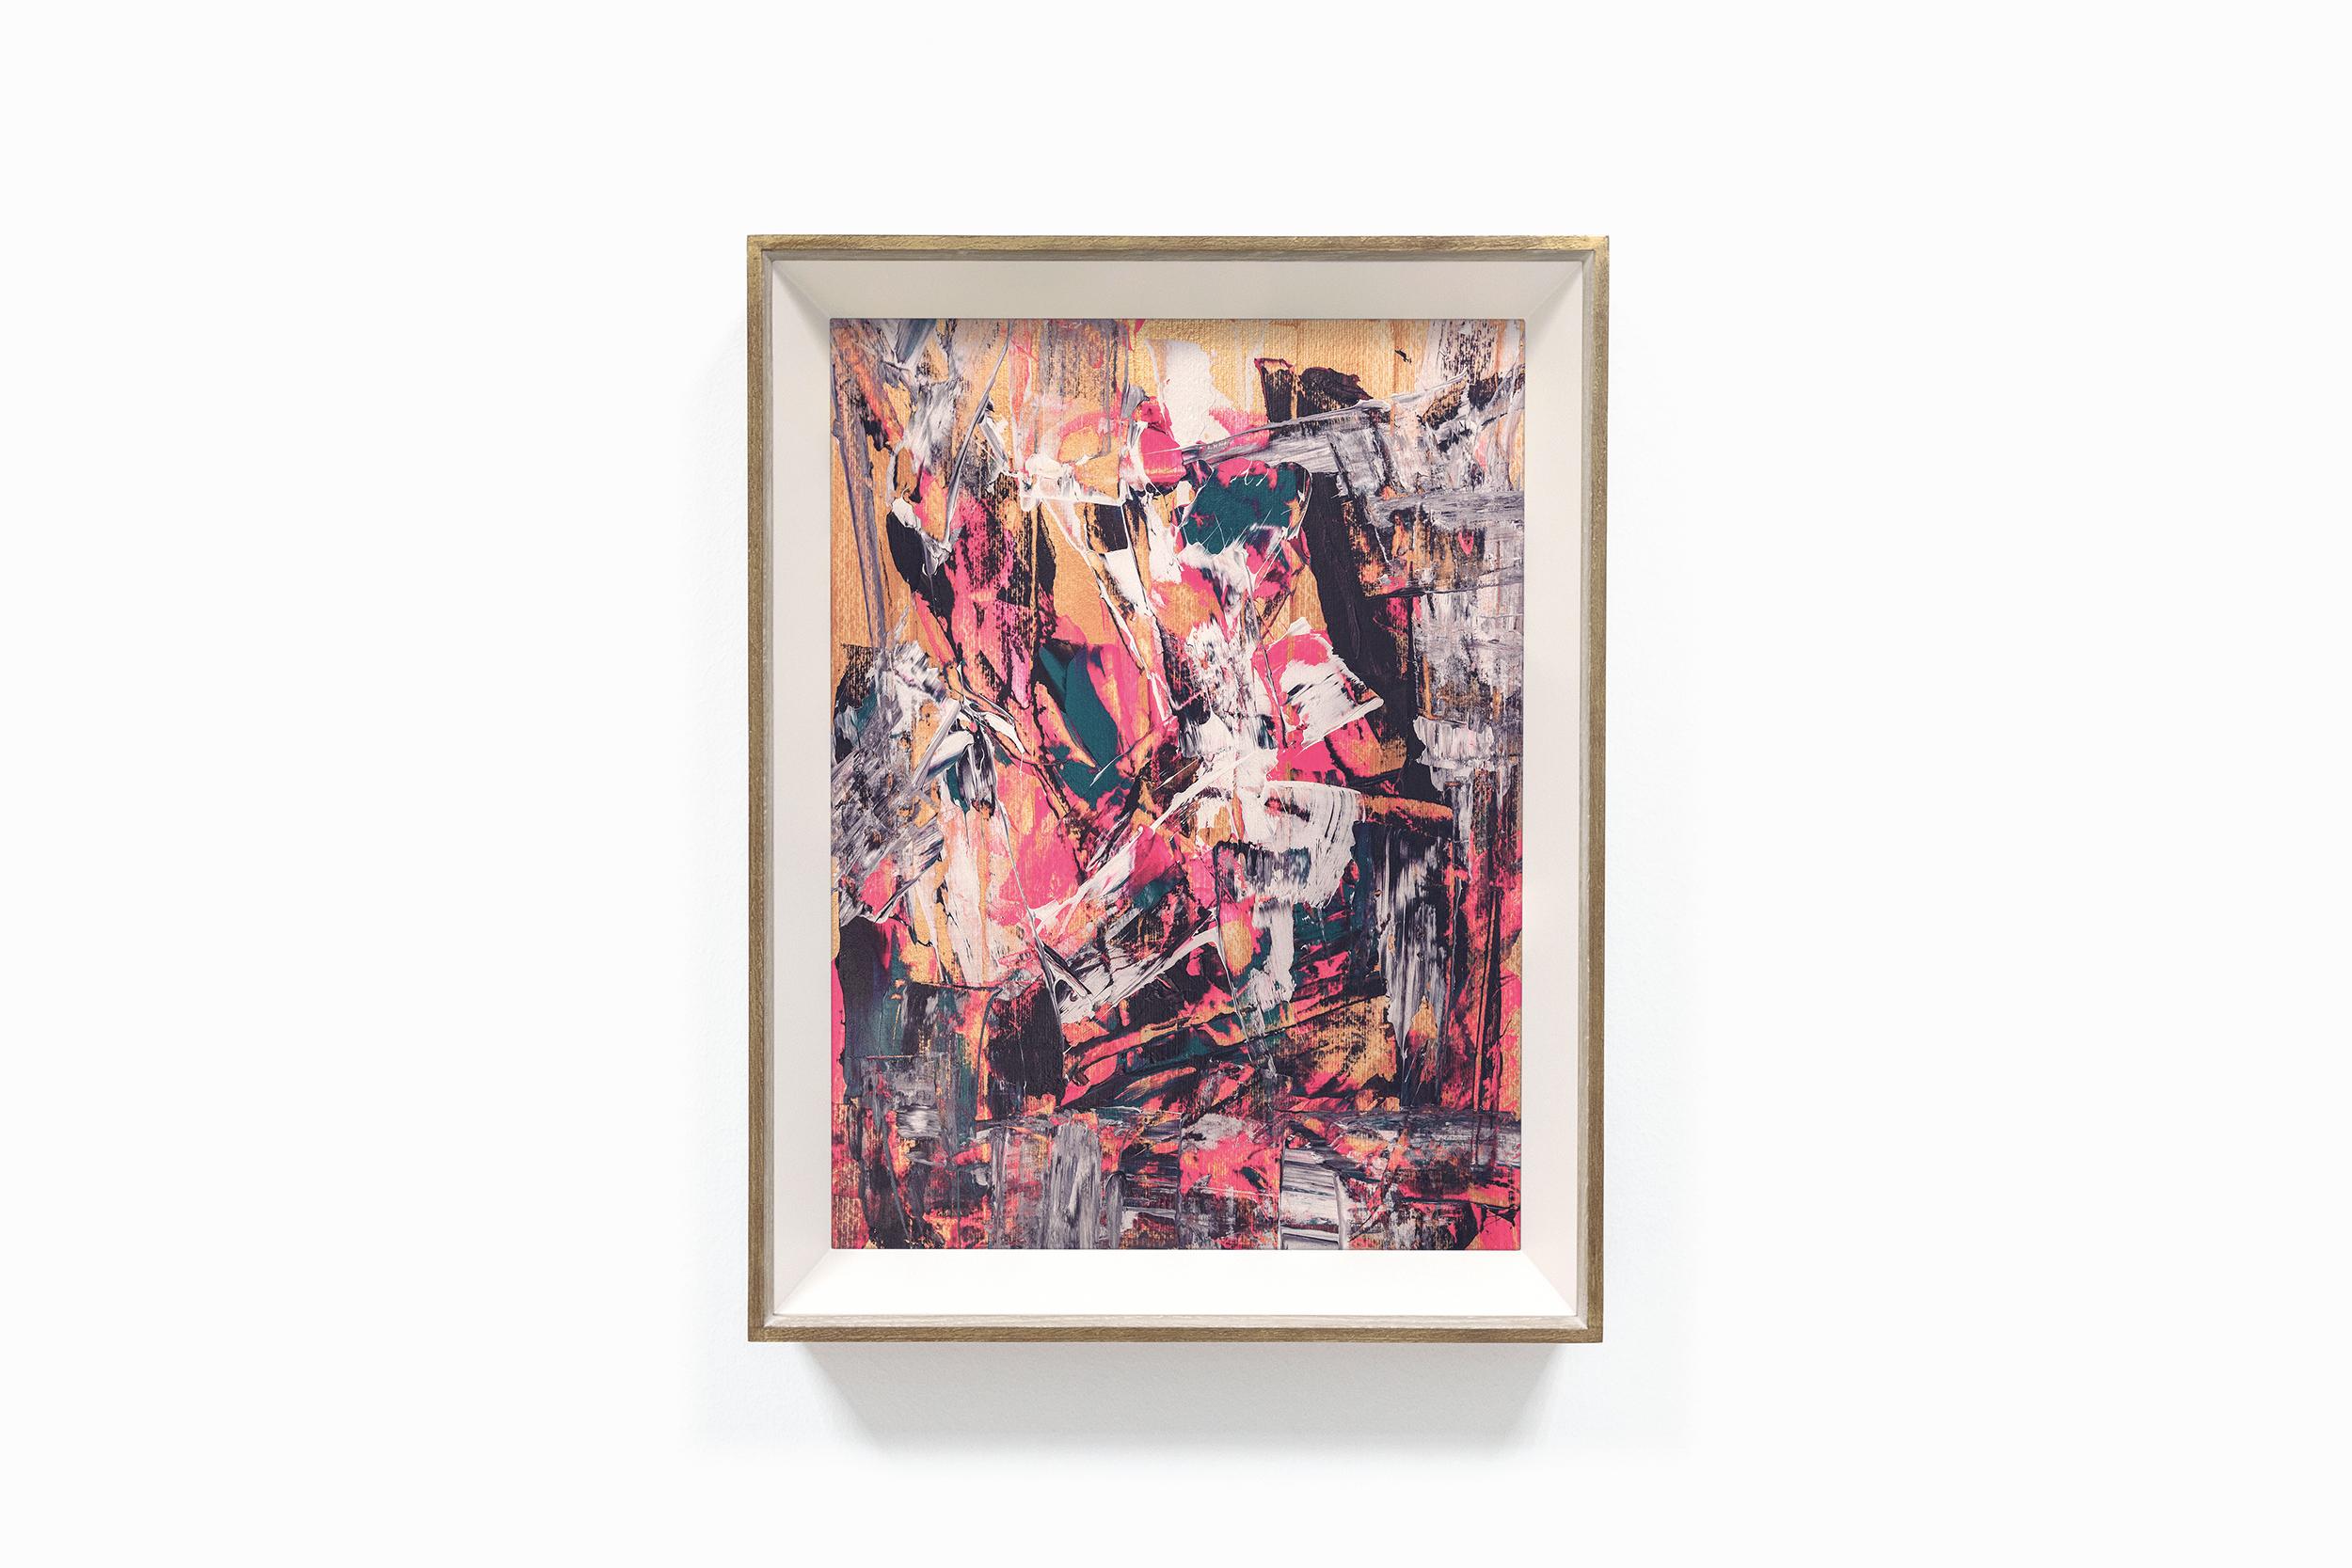 bonjourmolotov+Golden+rage+Illustration+Ilustracao+painting+pintura+acrylic+acrílico+canvas+tela+paper+cardboard+mdf+Andre+Gigante+04N.jpg